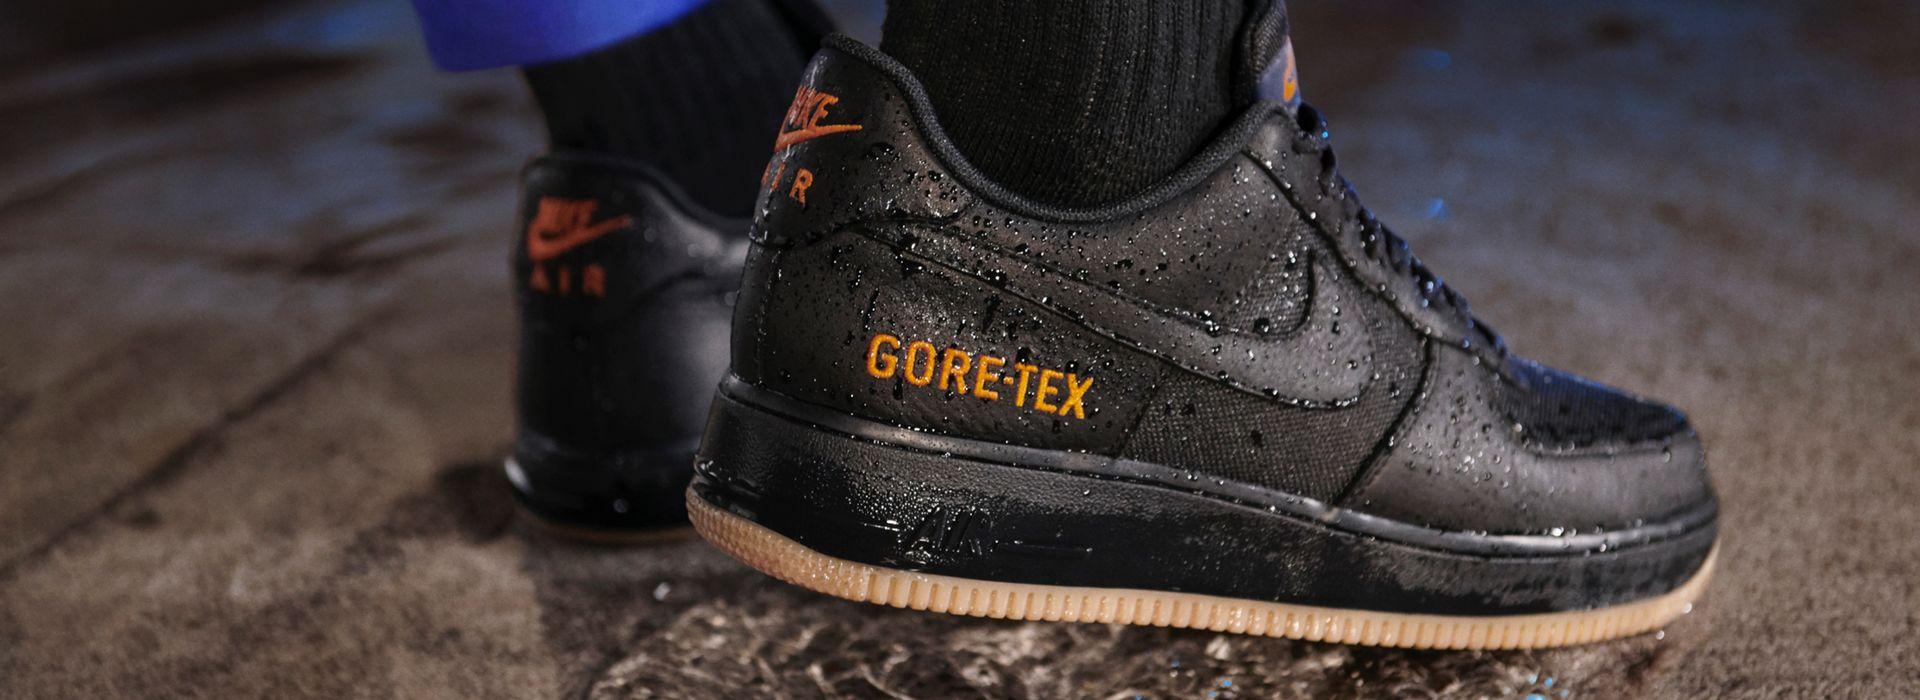 best sneakers clearance sale best website Air Force 1. Nike.com